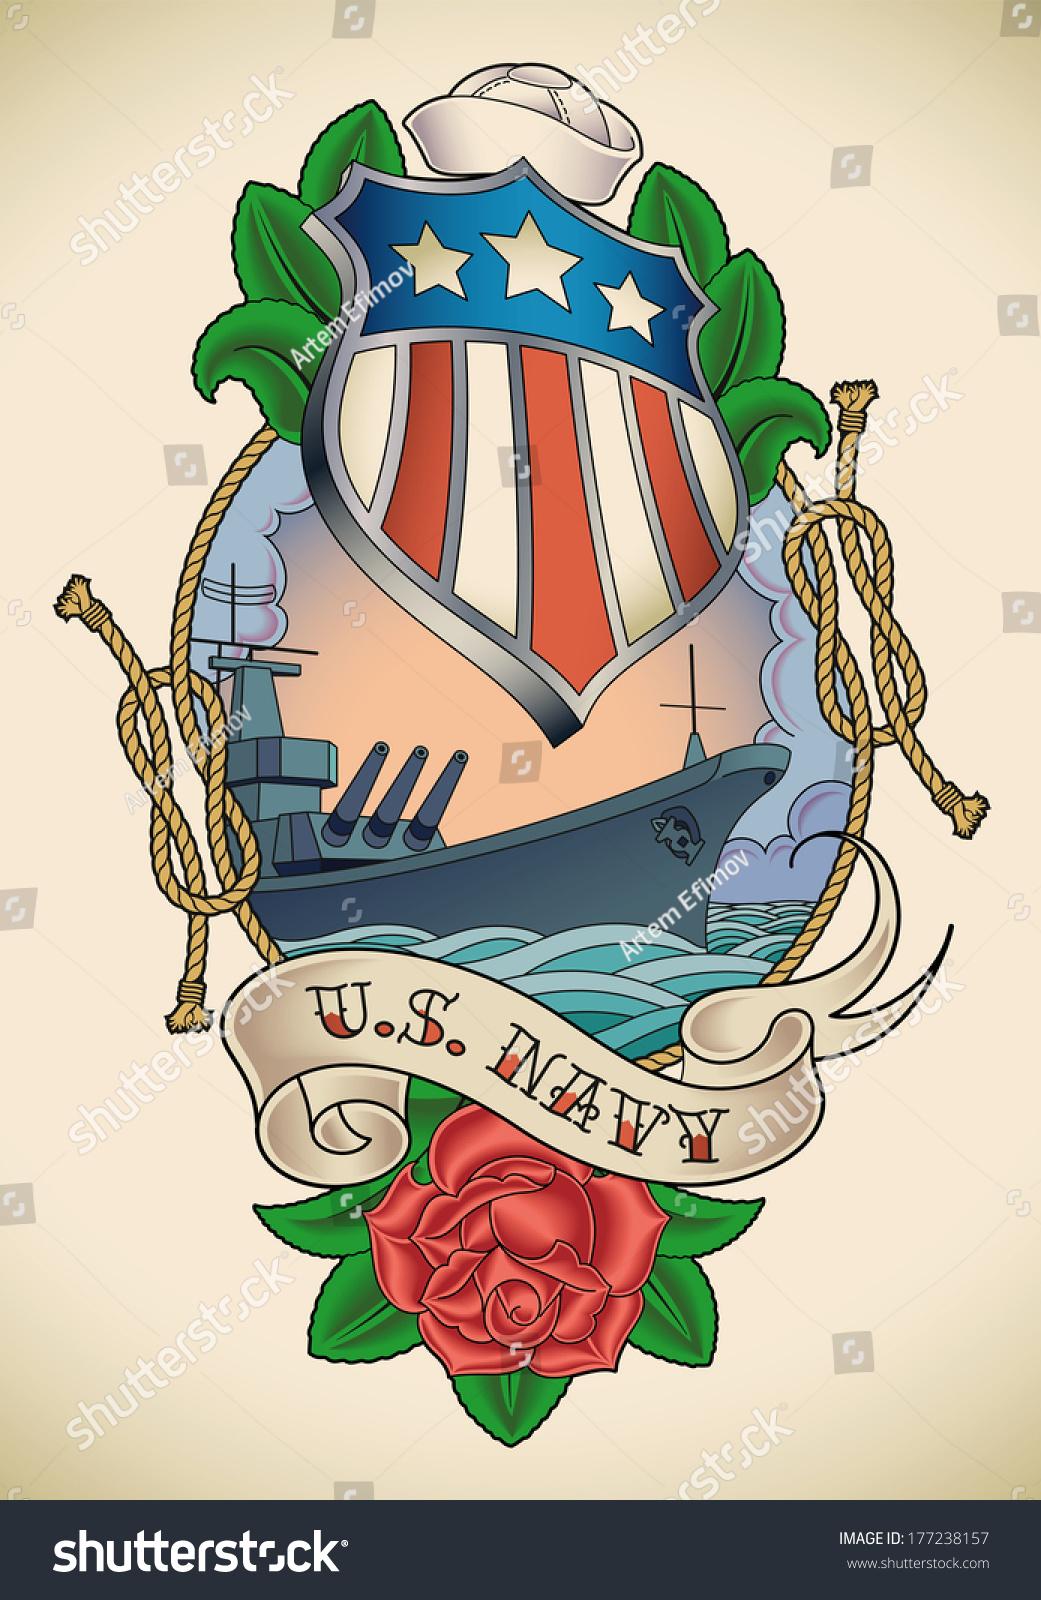 Oldschool us navy tattoo star striped stock illustration 177238157 old school us navy tattoo of a star striped shield battleship banner and buycottarizona